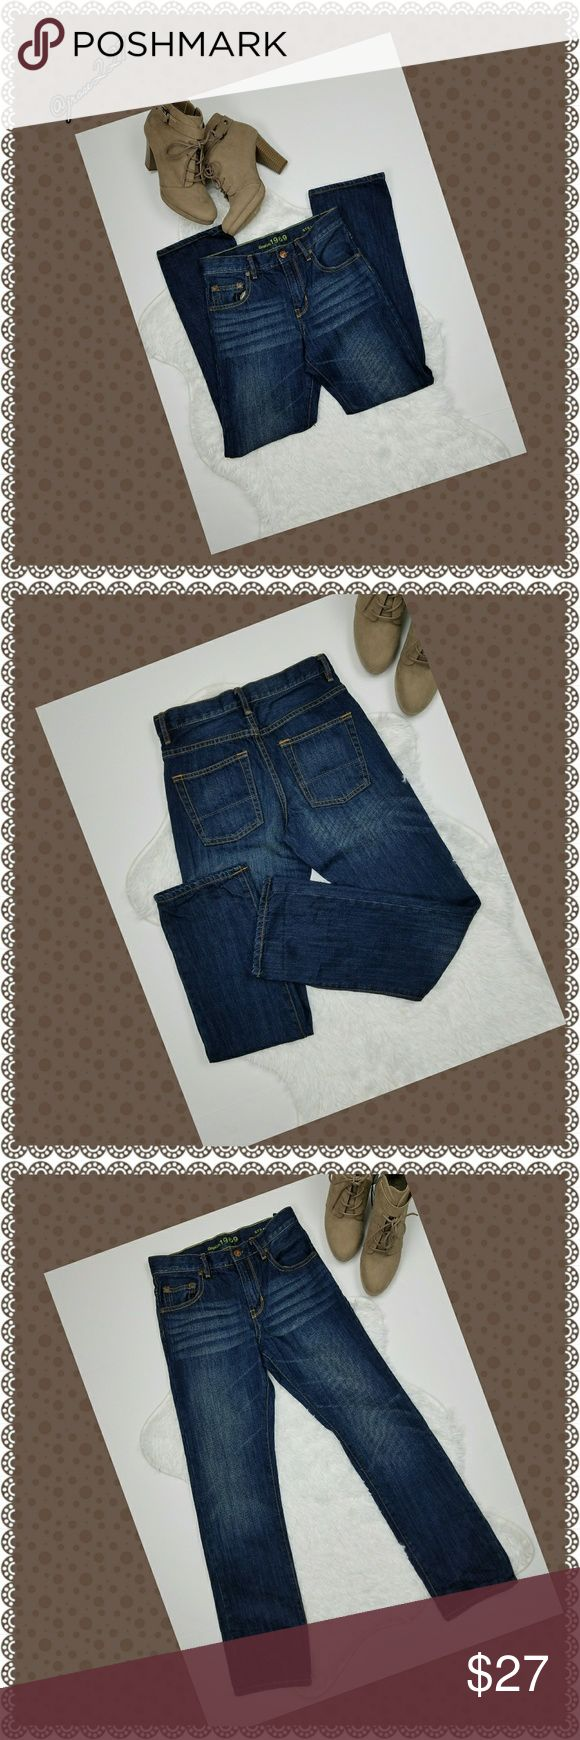 GAPKids 1969 Straight Cut Jeans GapKids denim jeans regular size 14  Good condition 100% Cotton GapKids Jeans Straight Leg